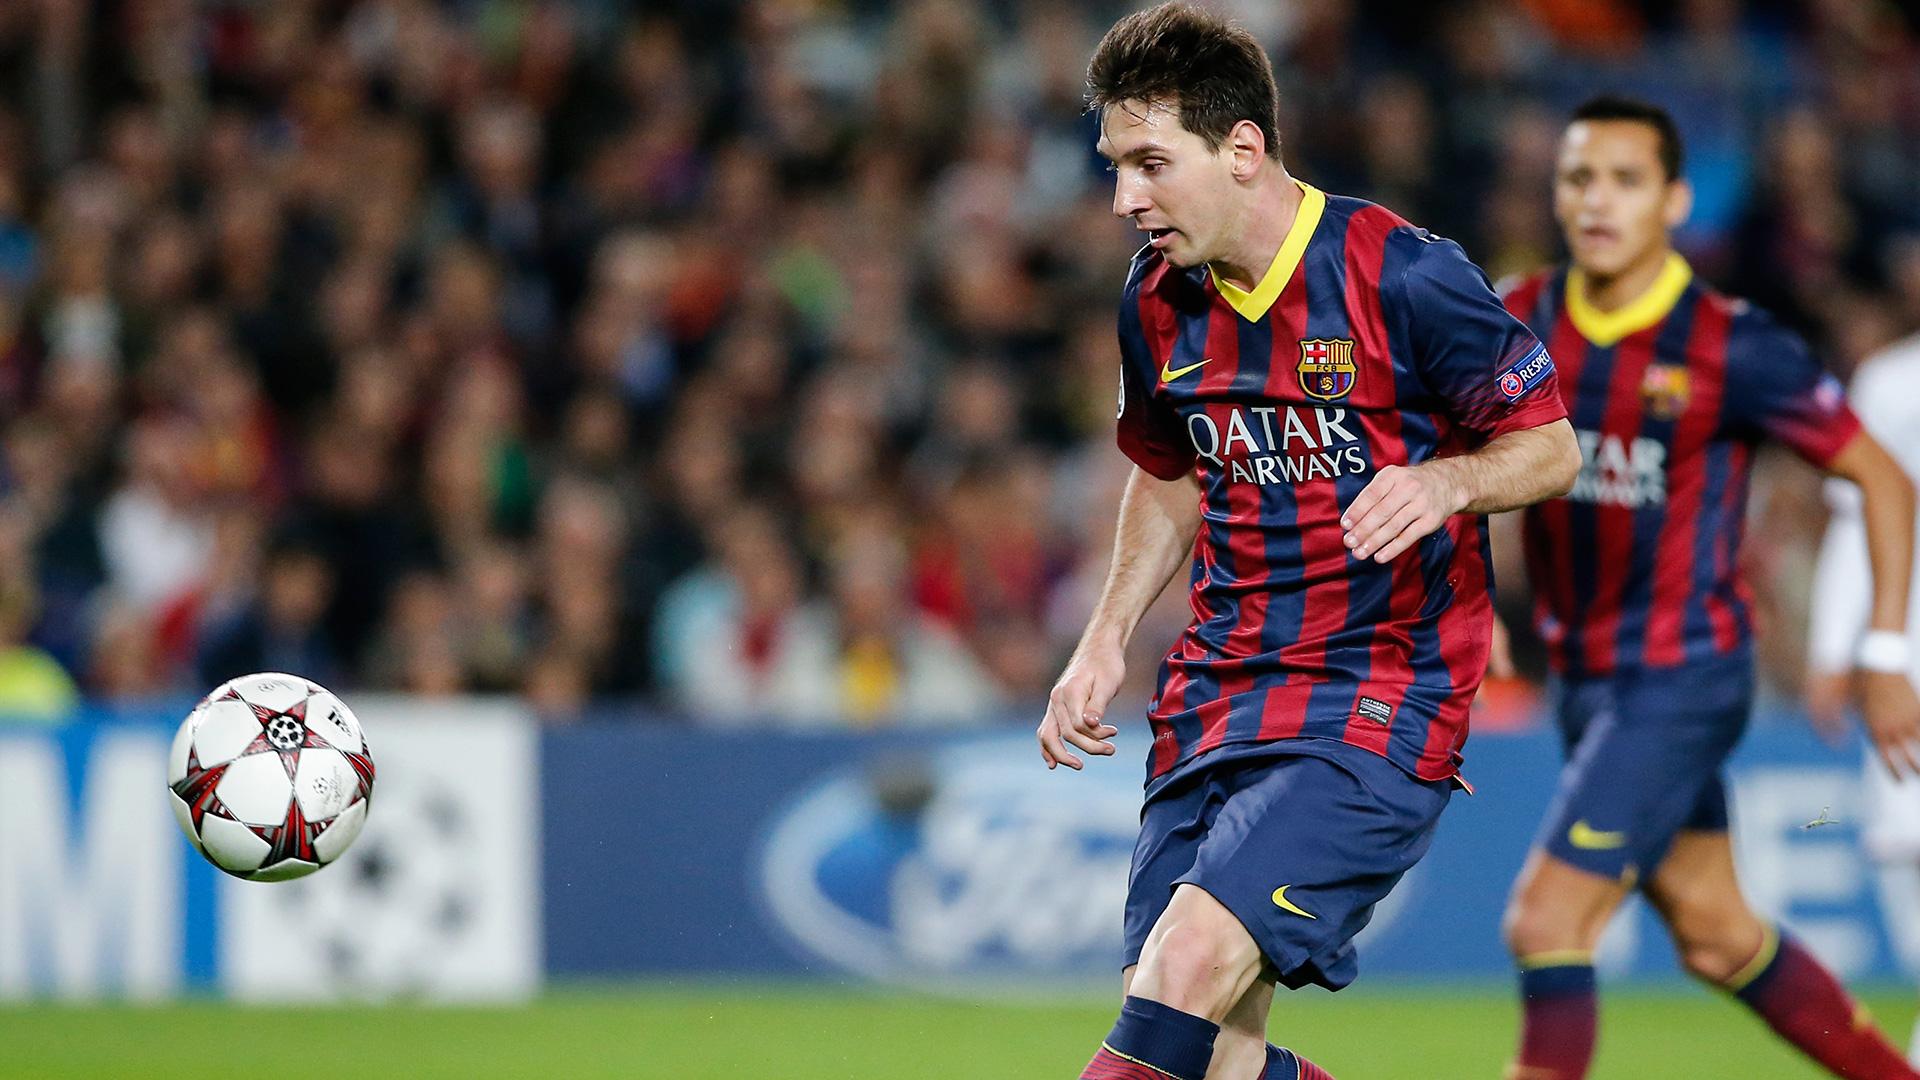 Lionel-Messi-010214-AP-FTR.jpg